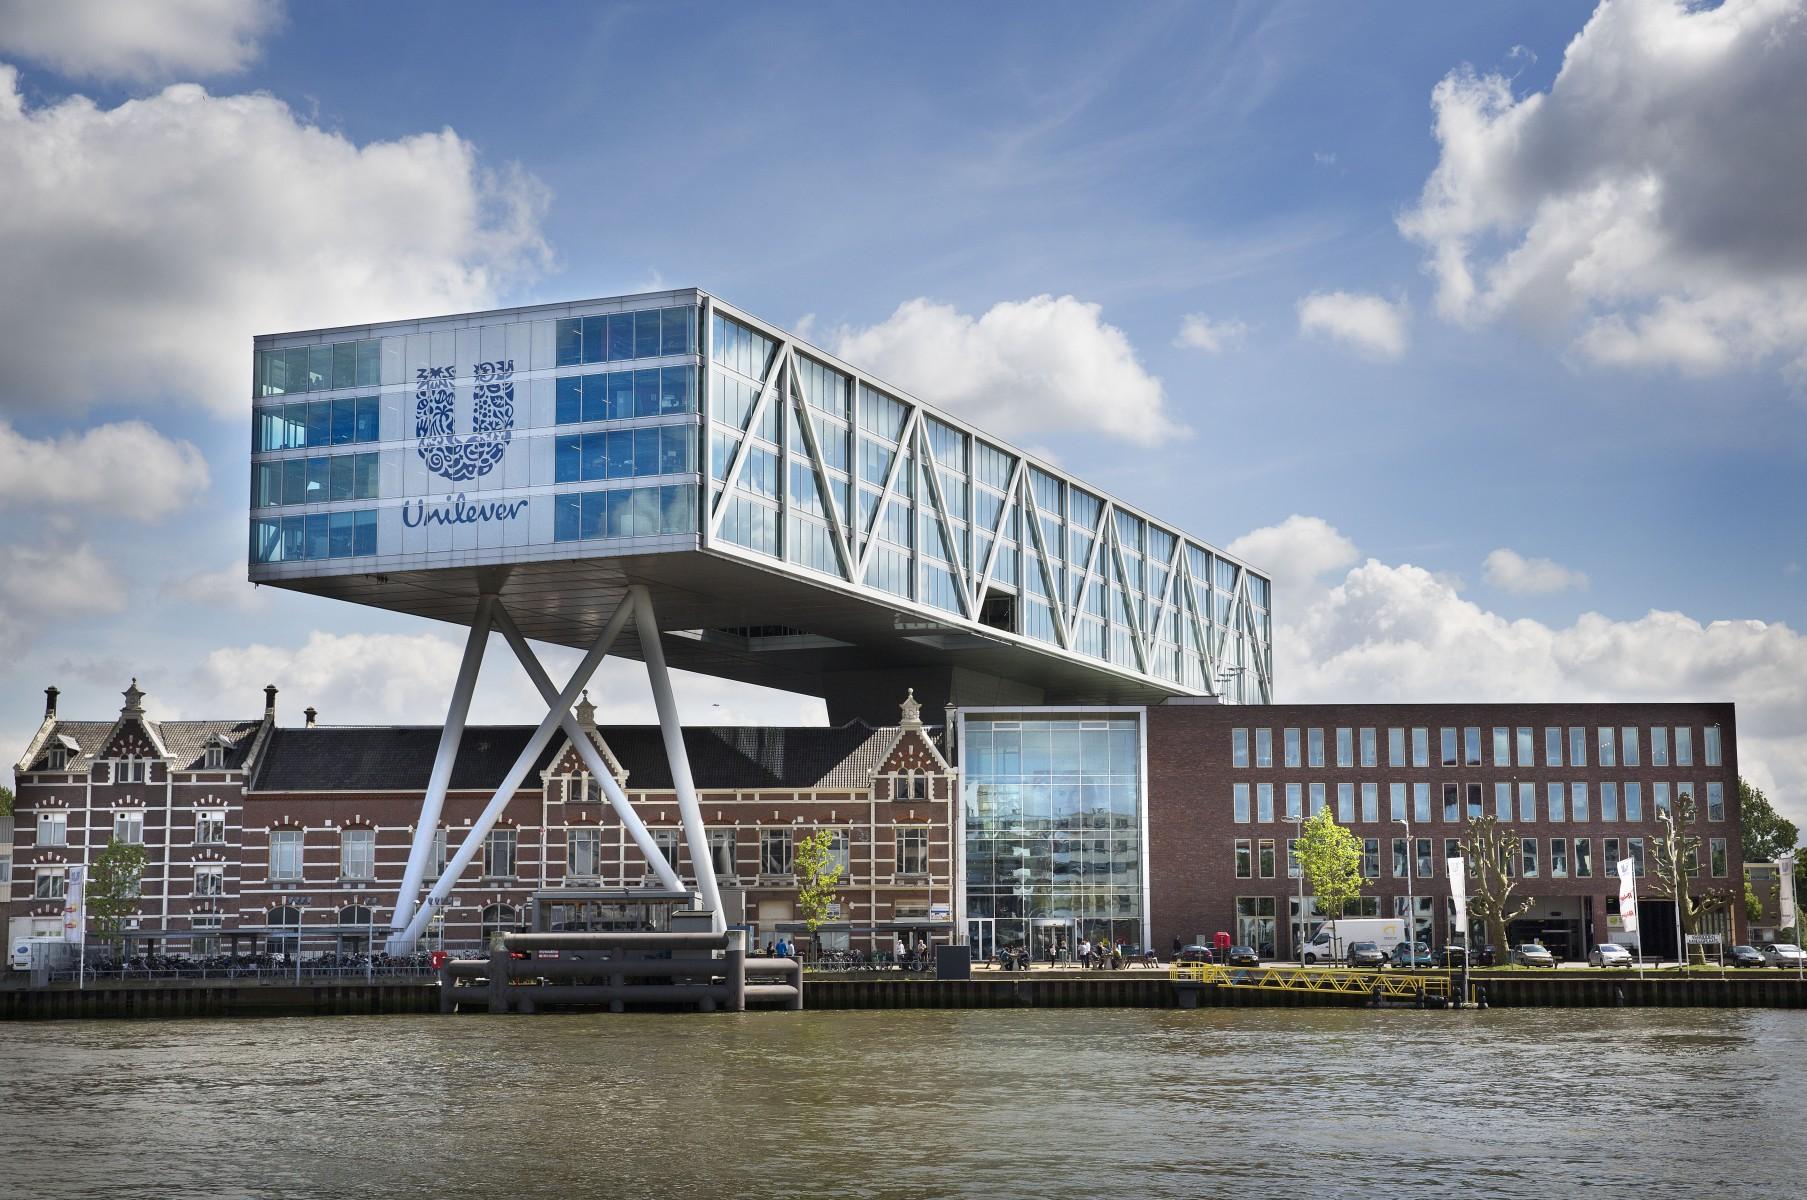 Unilever-kantoor Rotterdam-Zuid